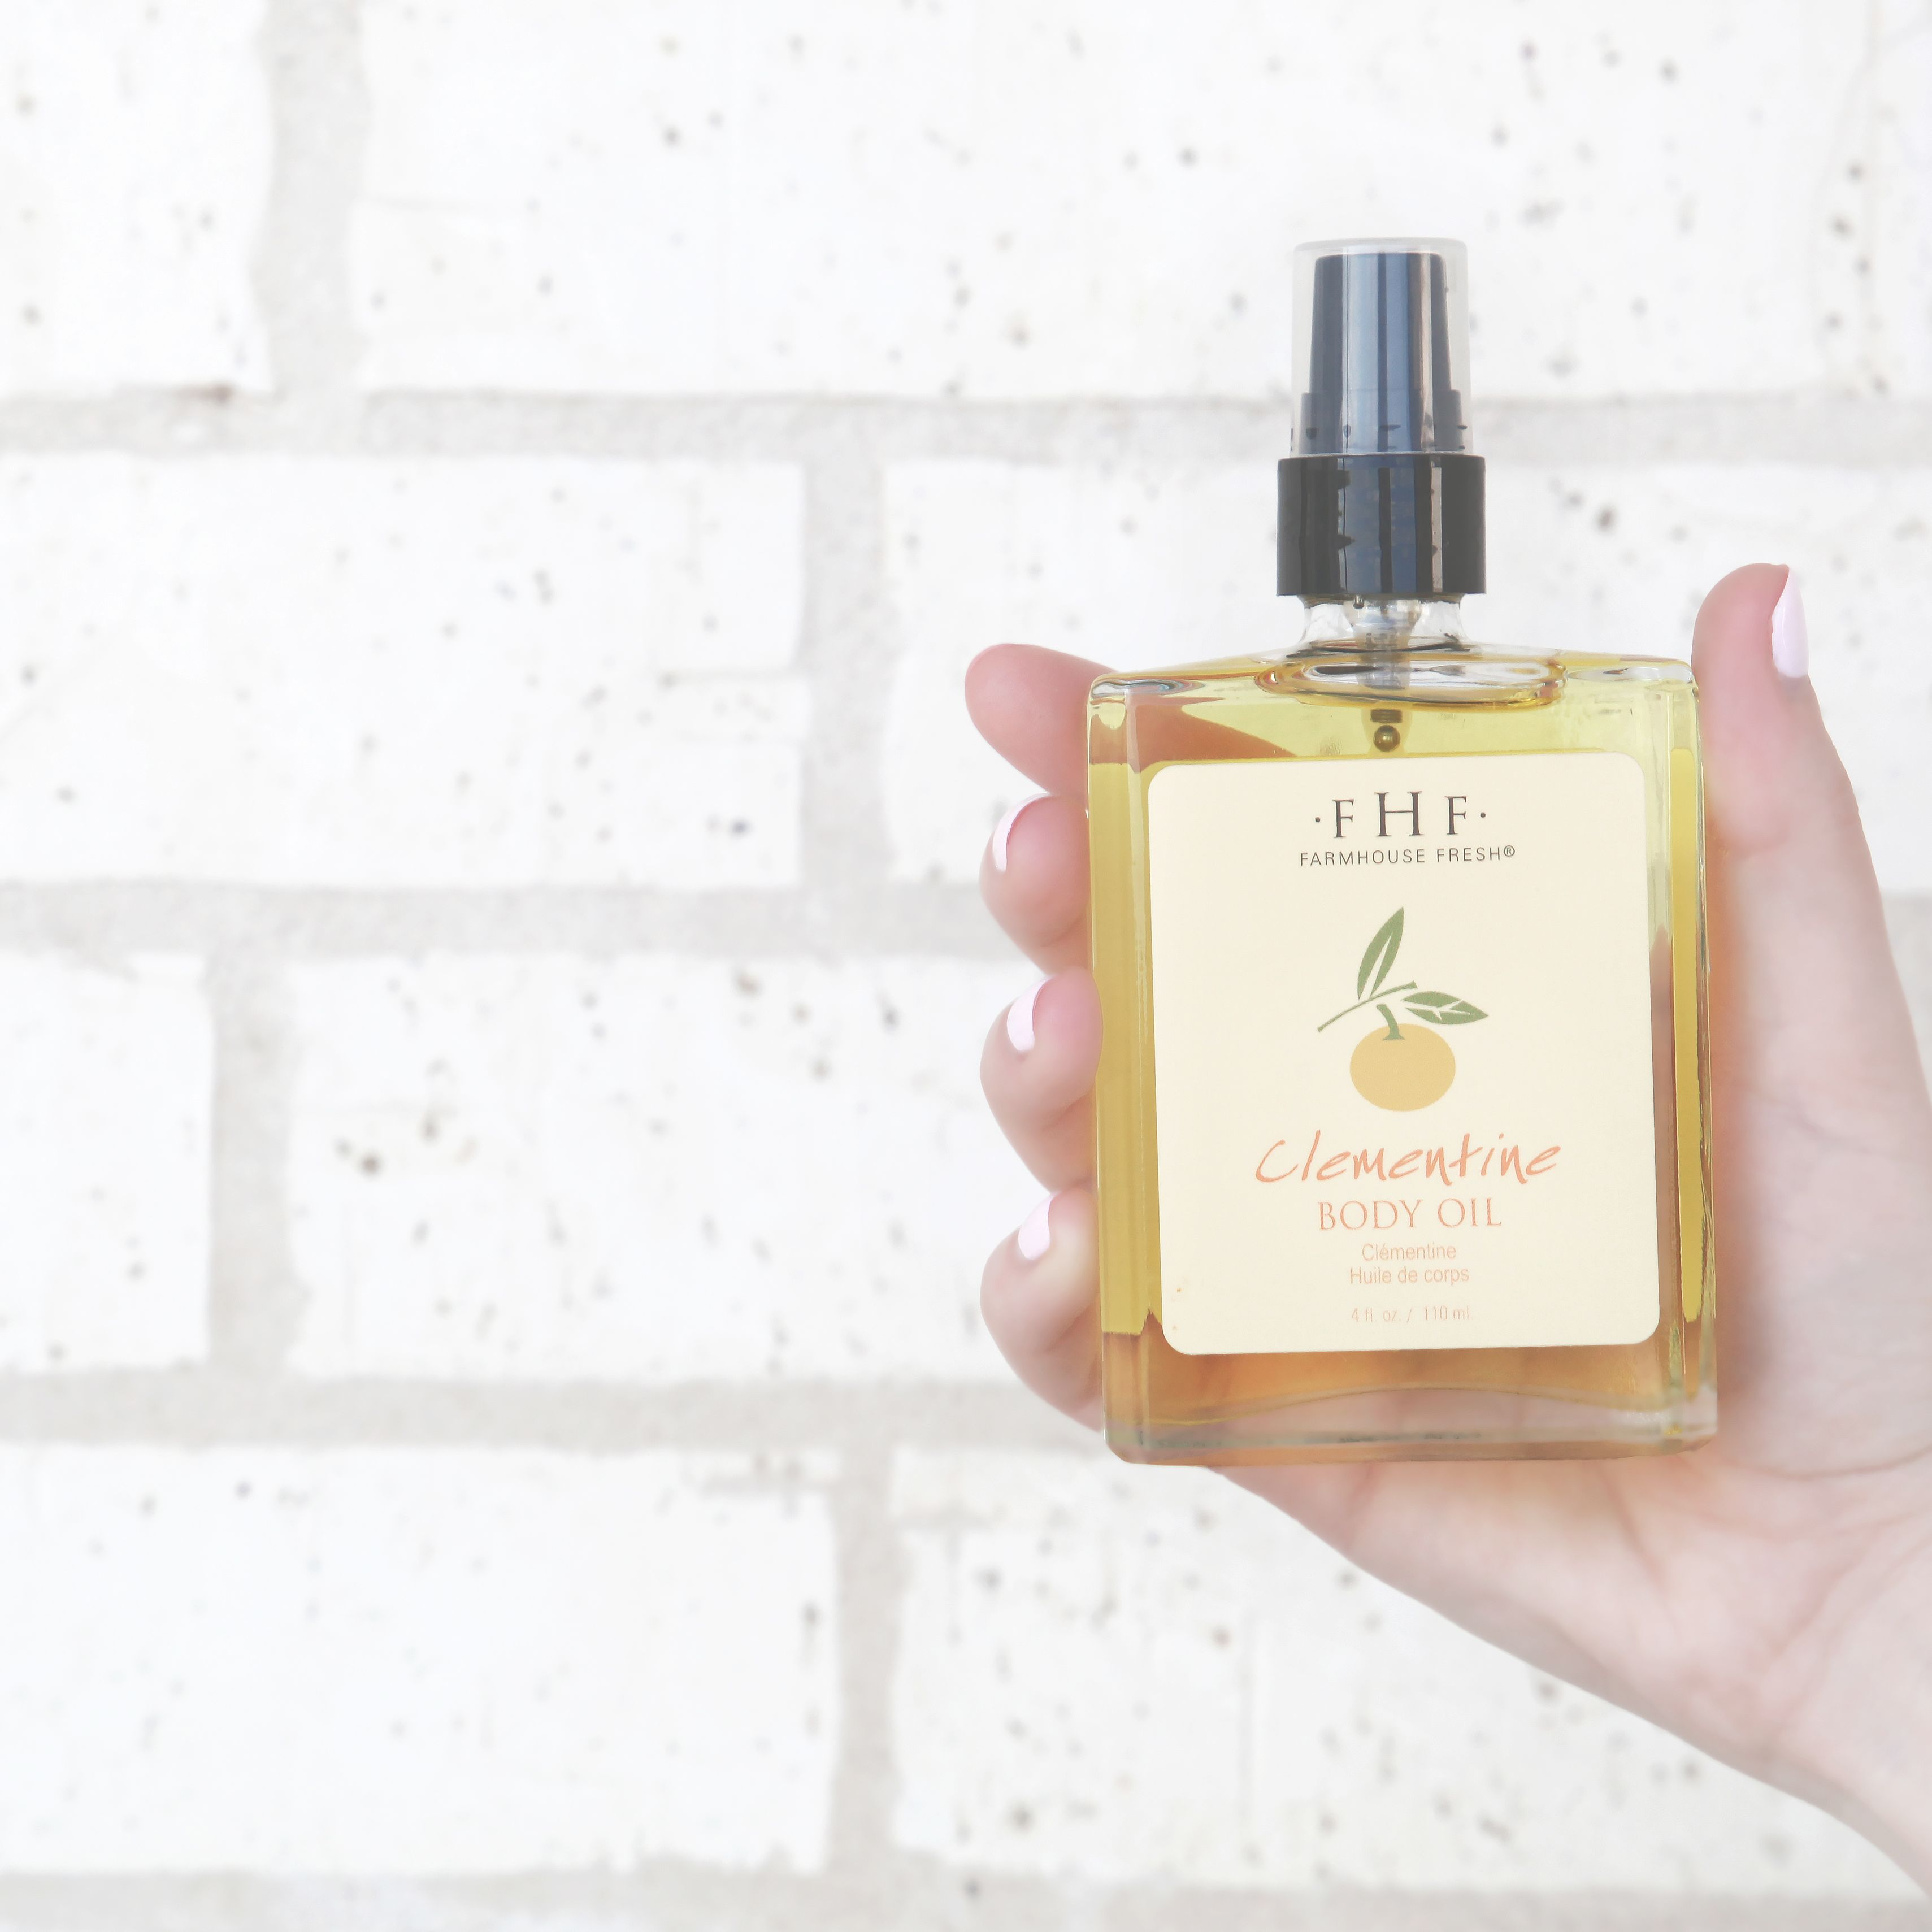 Clementine Body Oil Body oil, Body lotion, Oils